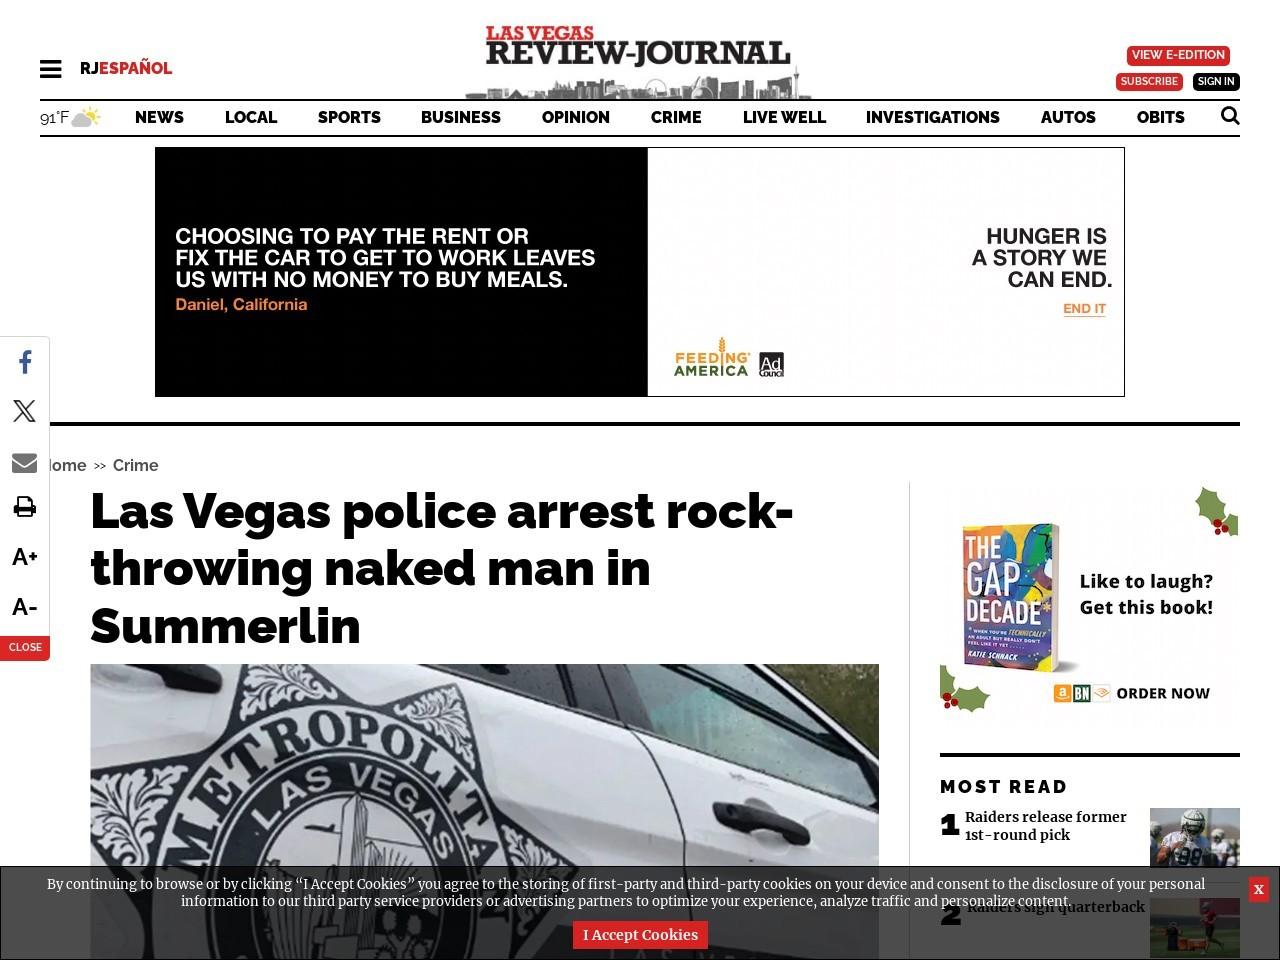 Las Vegas police arrest rock-throwing naked man in Summerlin